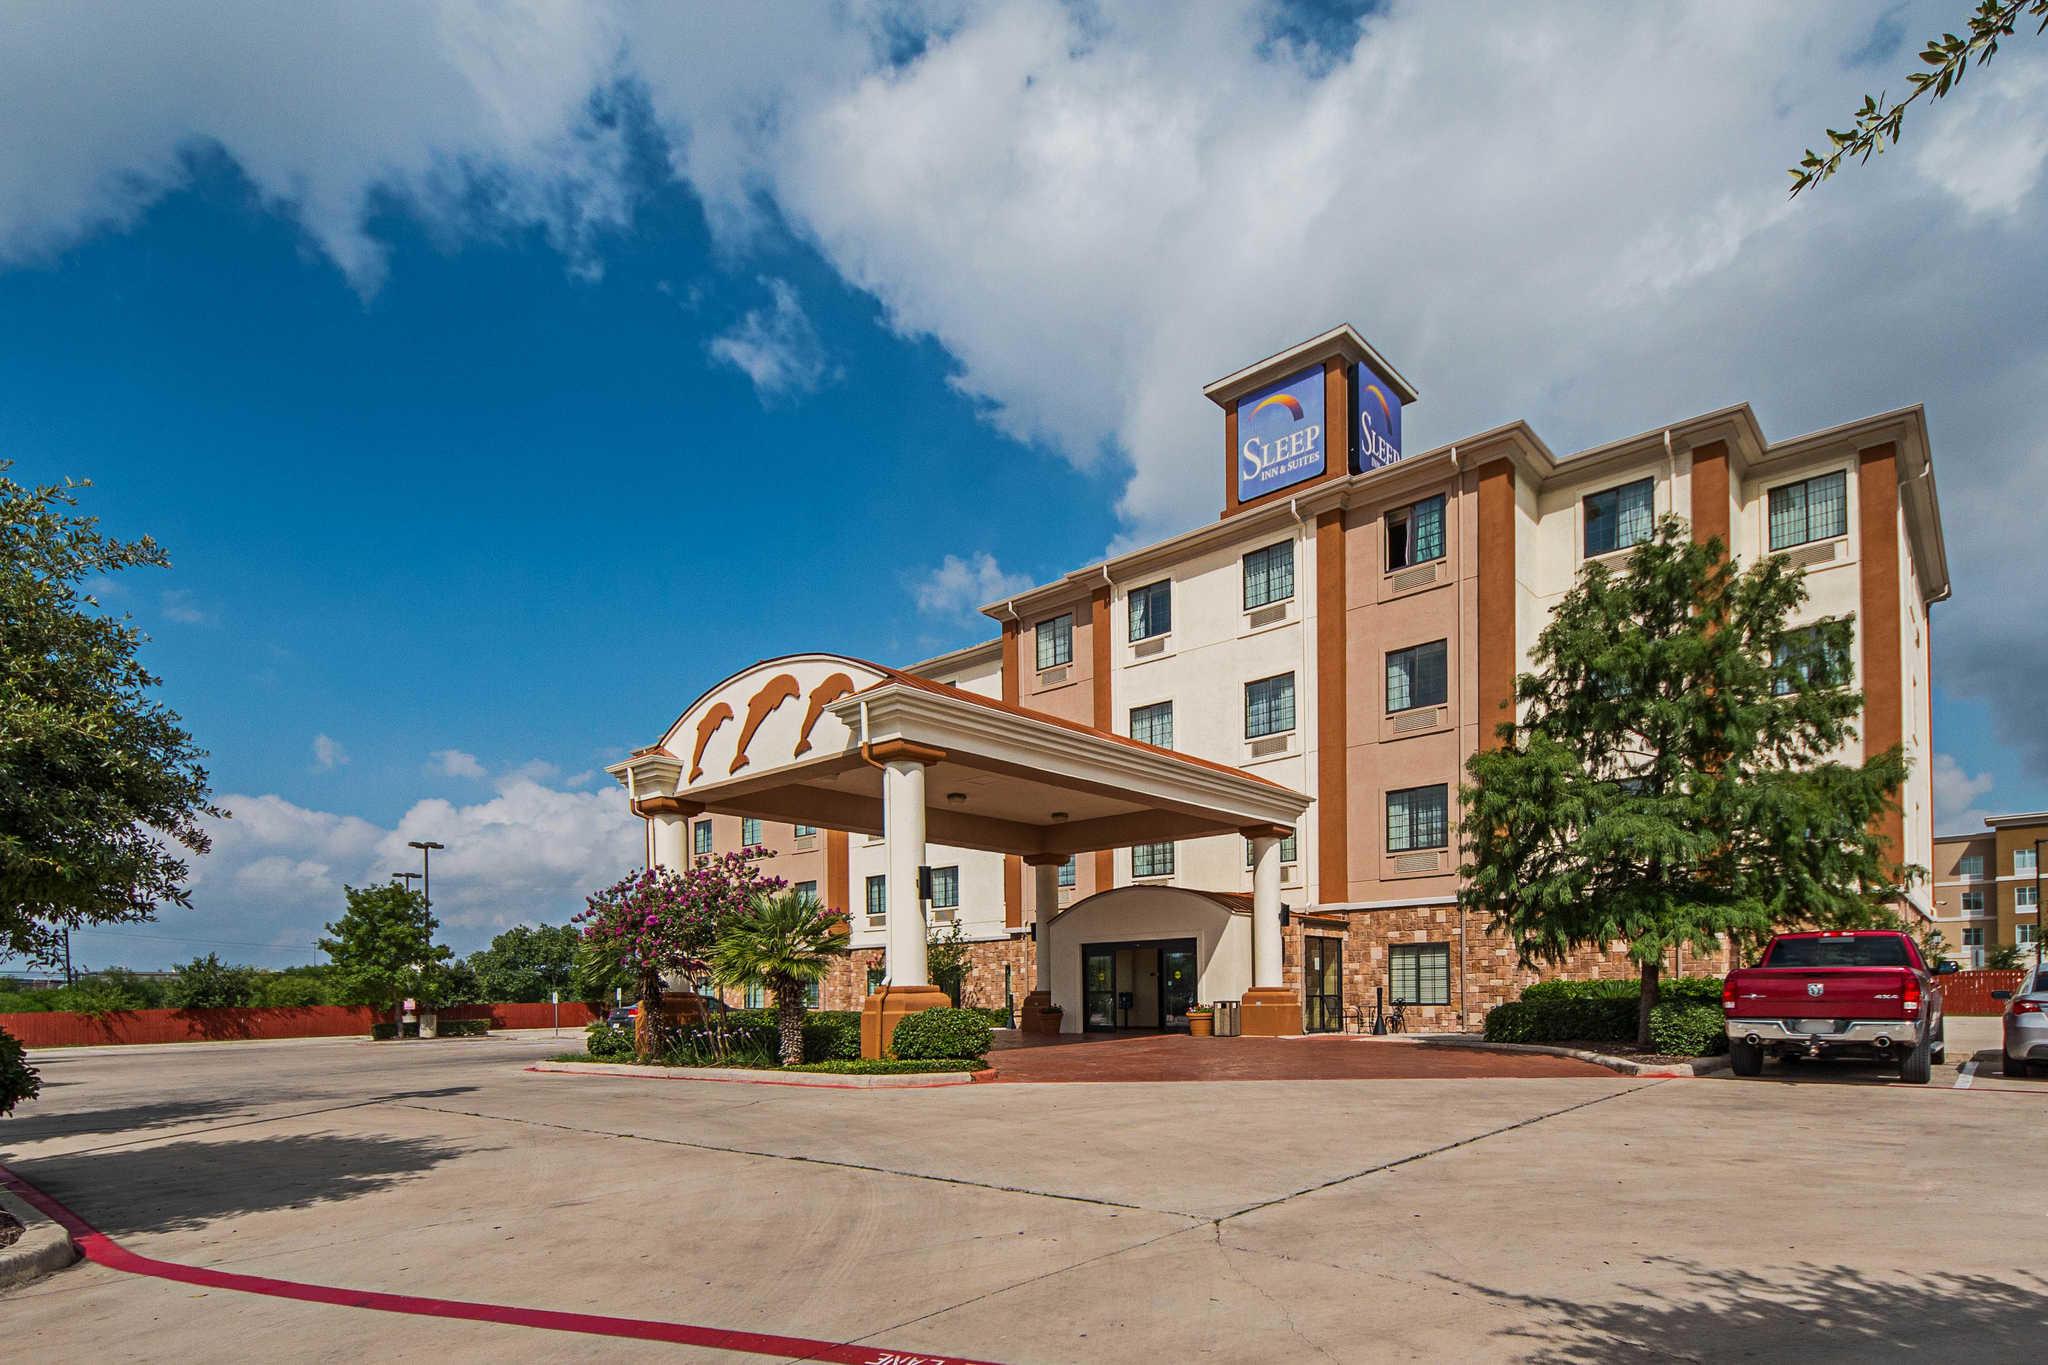 Sleep Inn Amp Suites Near Seaworld At 143 Richland Hills